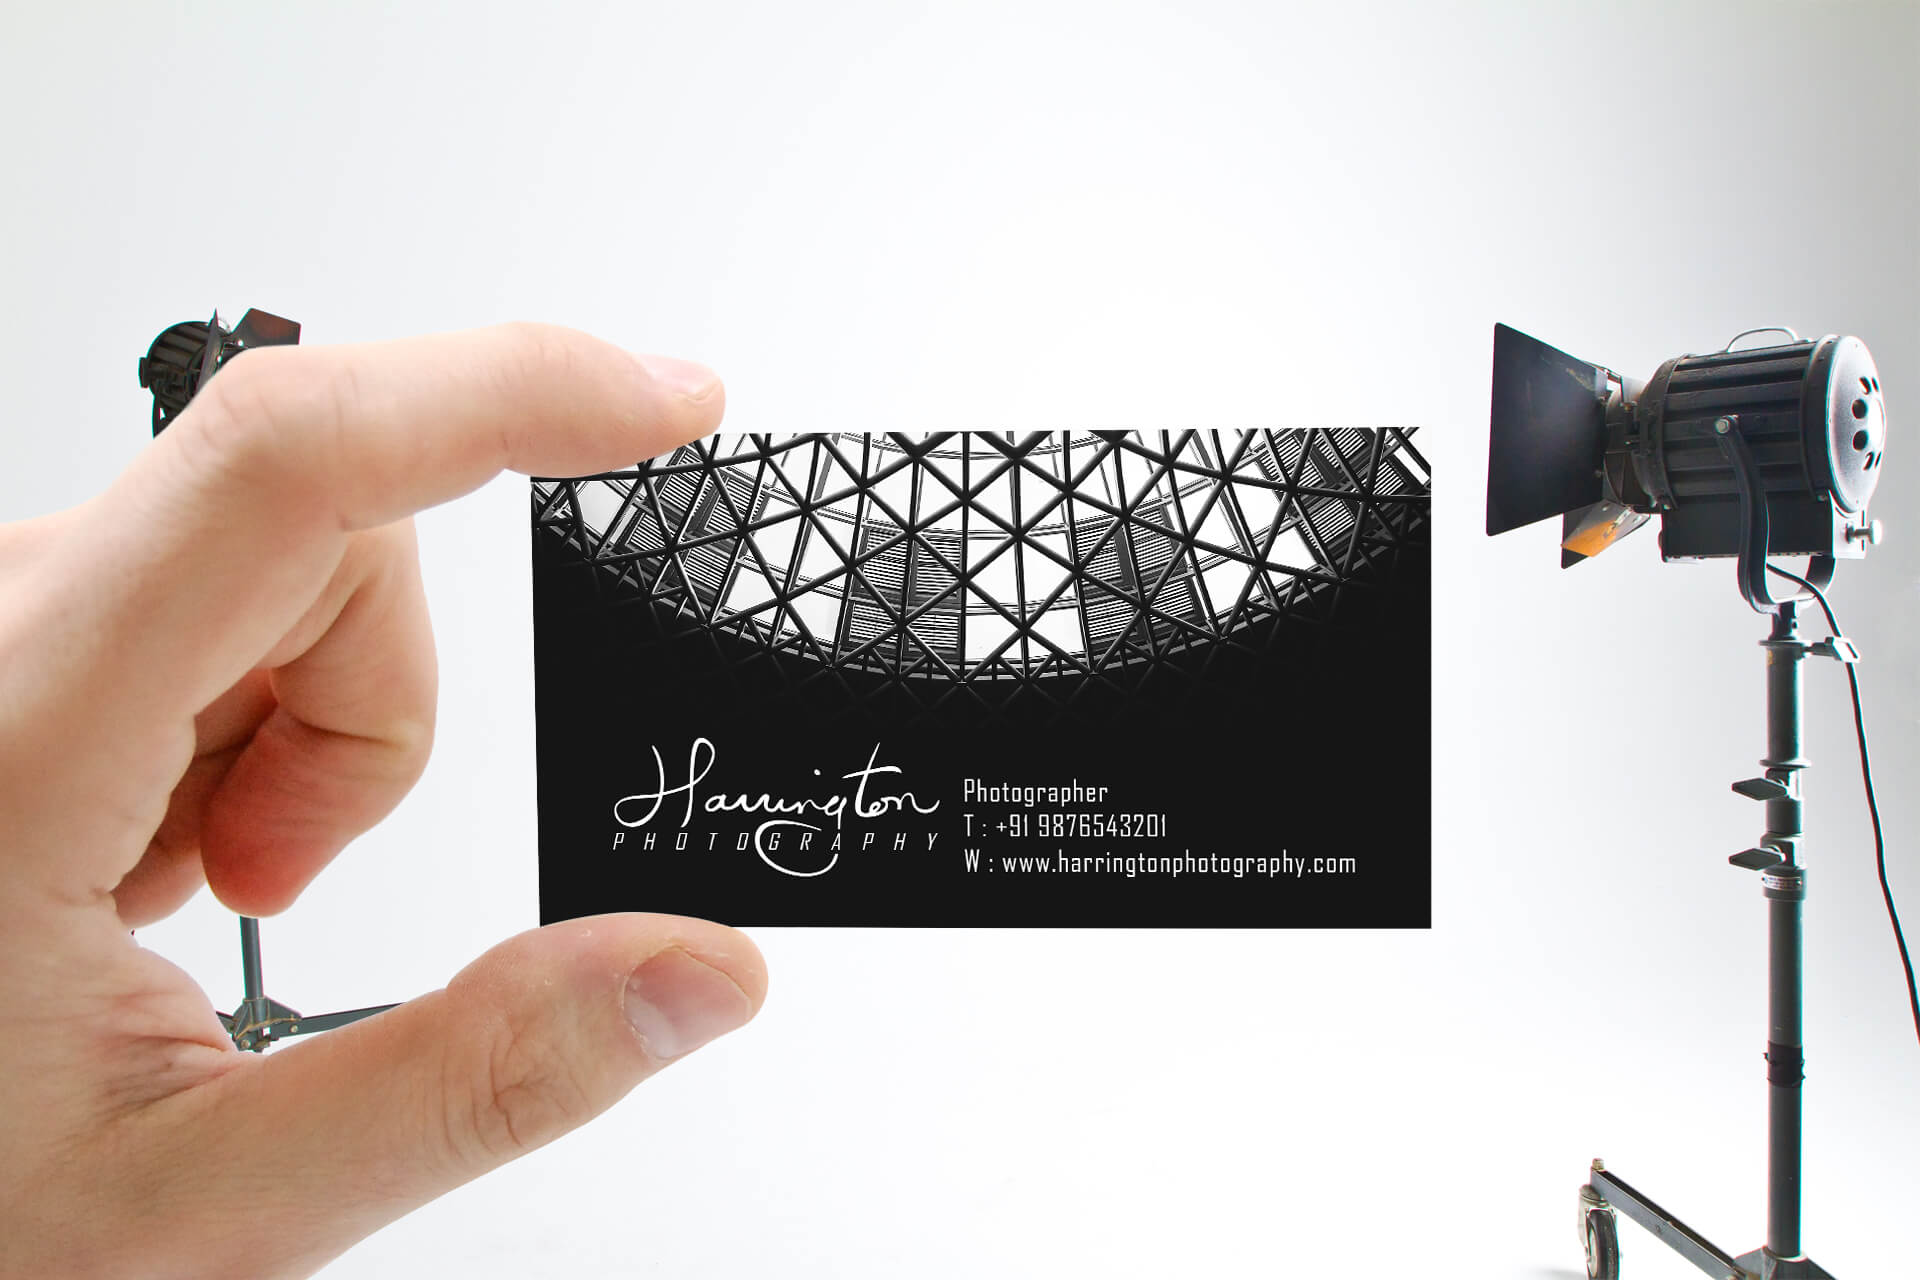 harrington photography business card mock up